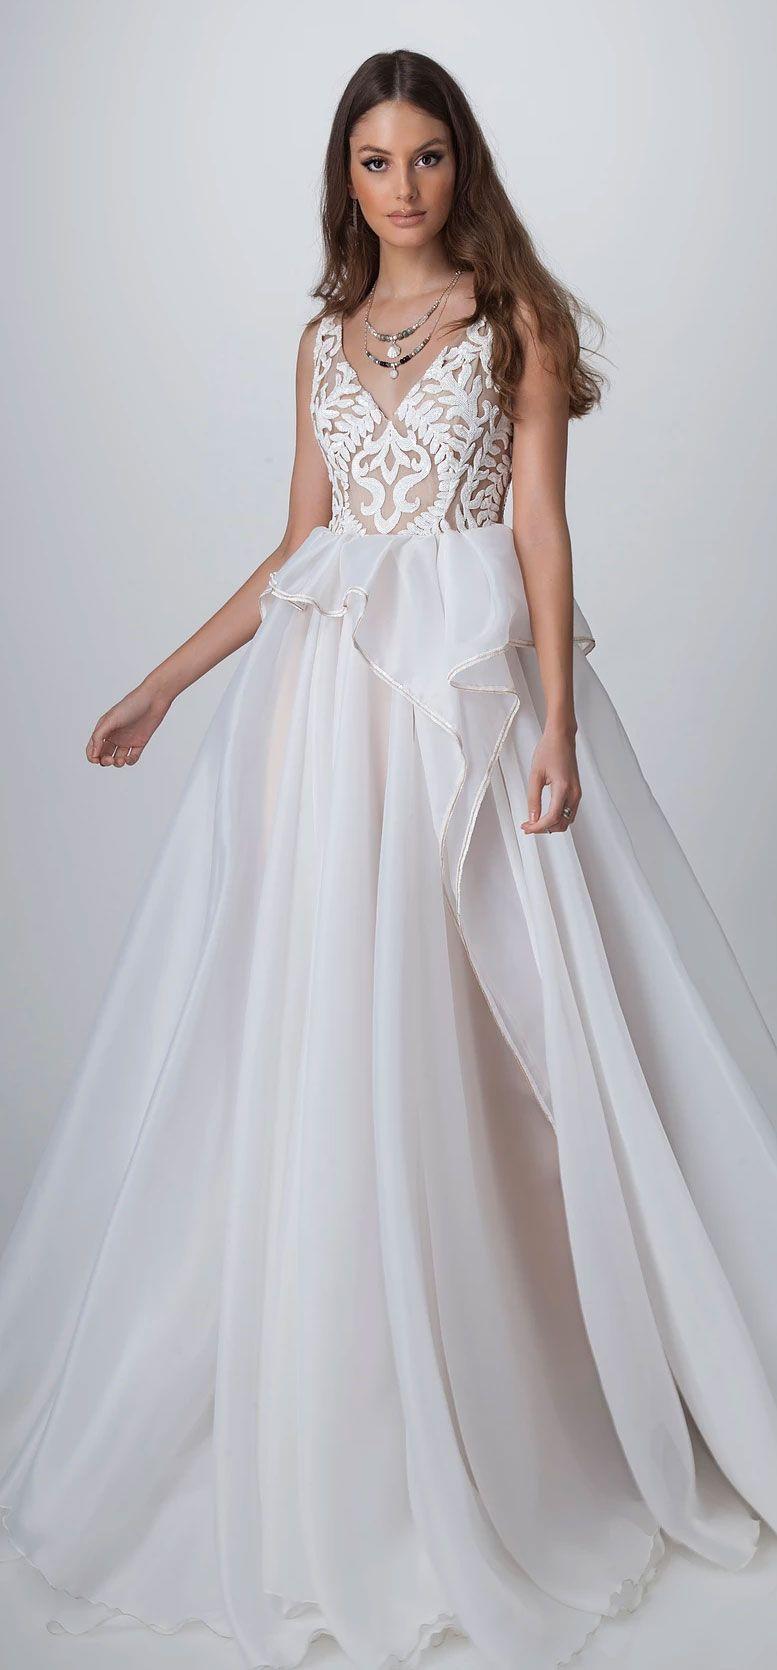 33+ What is boho style wedding dress ideas in 2021